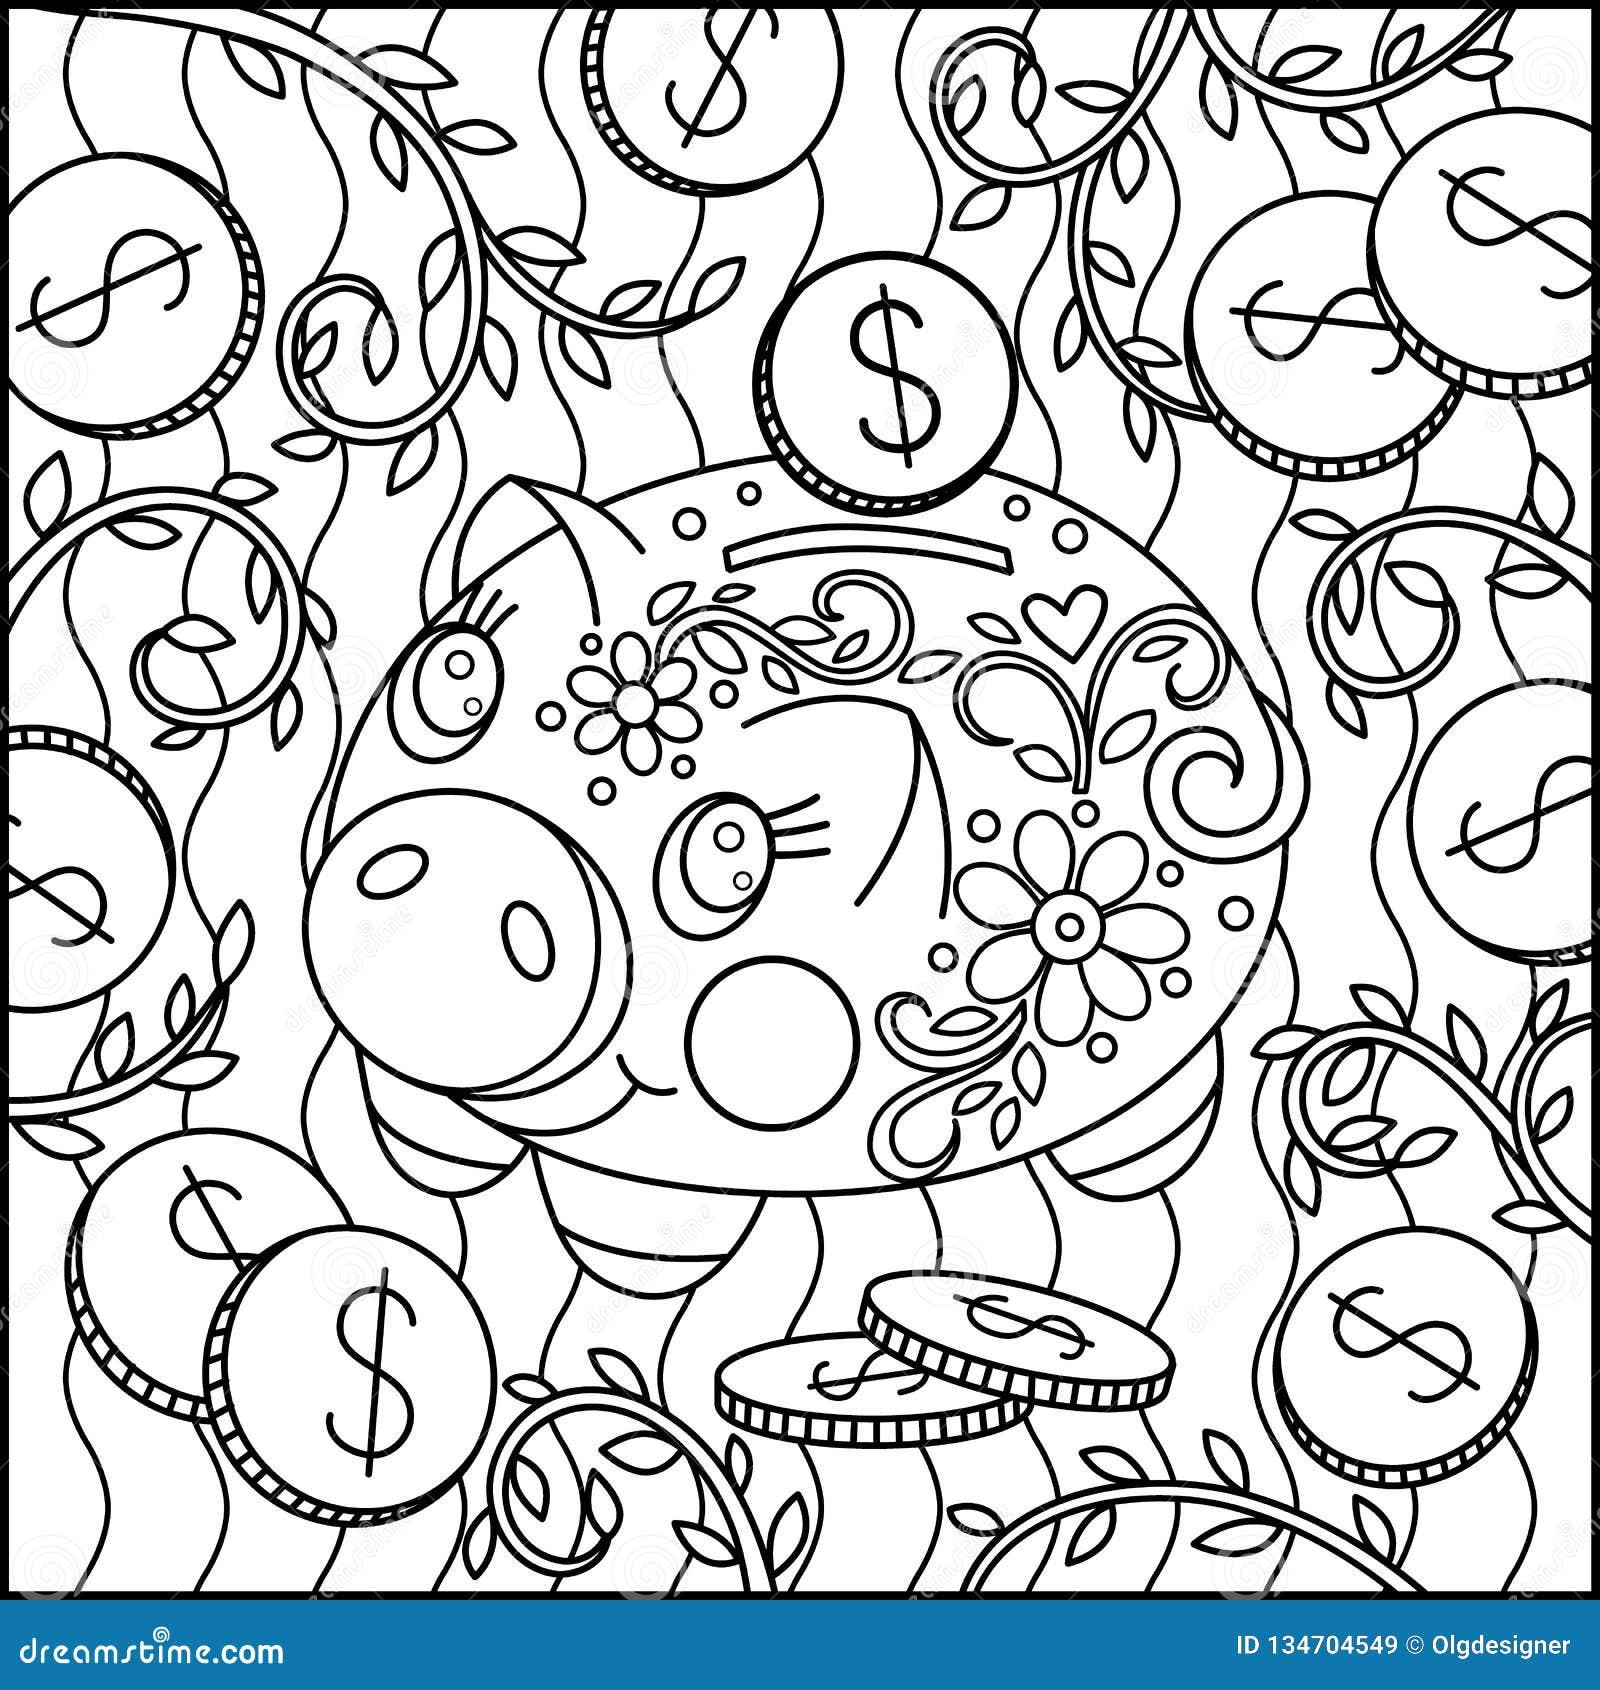 Creative Cartoon Cute Pig Coloring Page Stock Vector ...